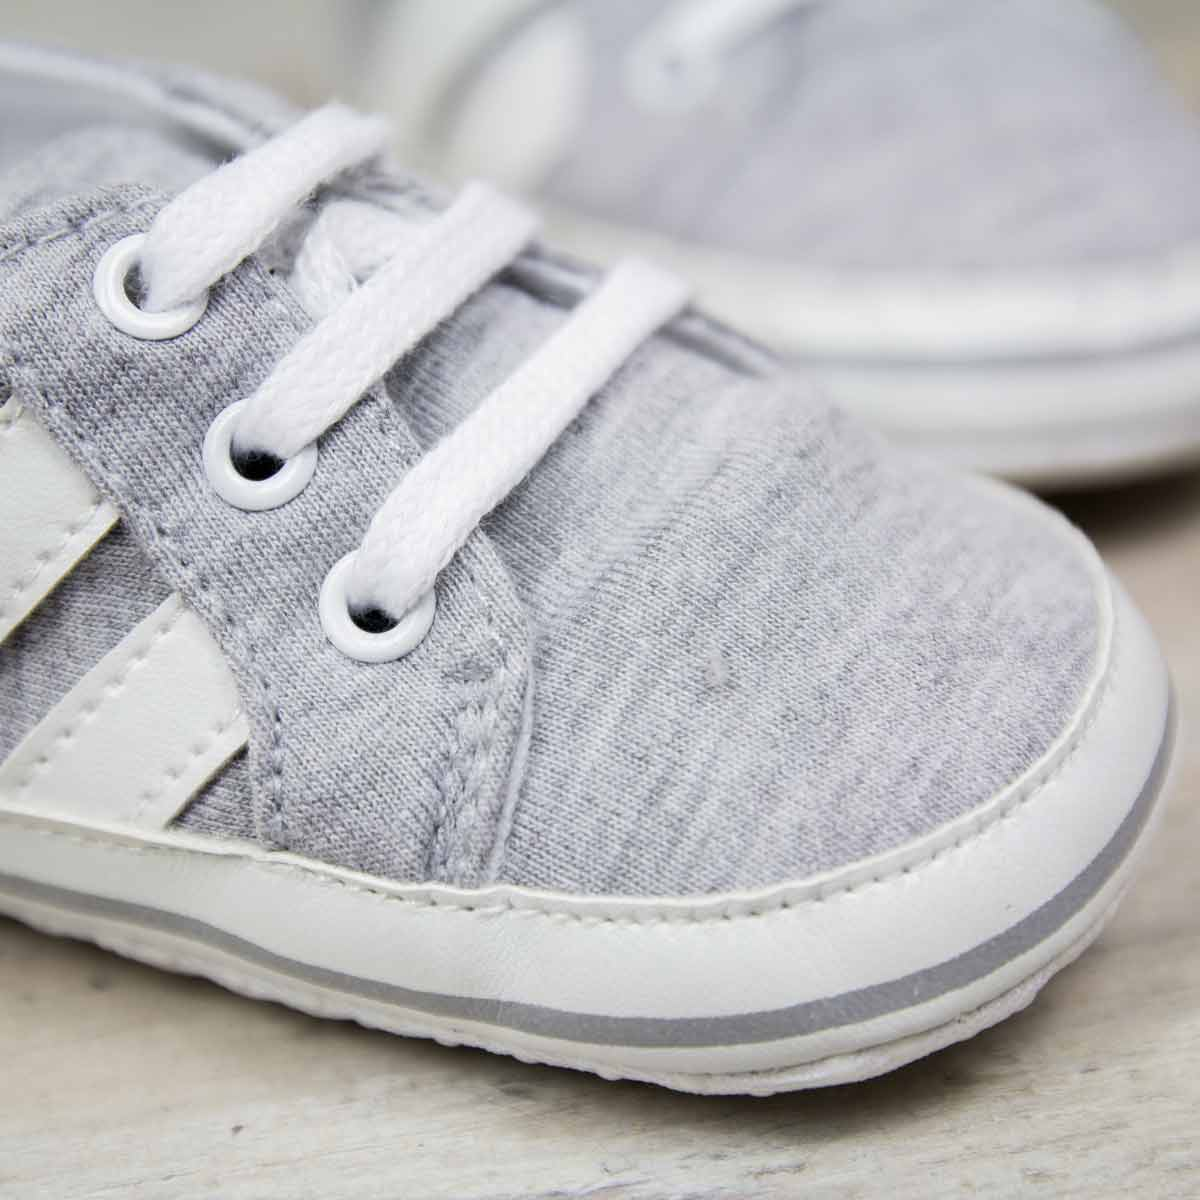 mrwonderful_zapatos-bebe_08